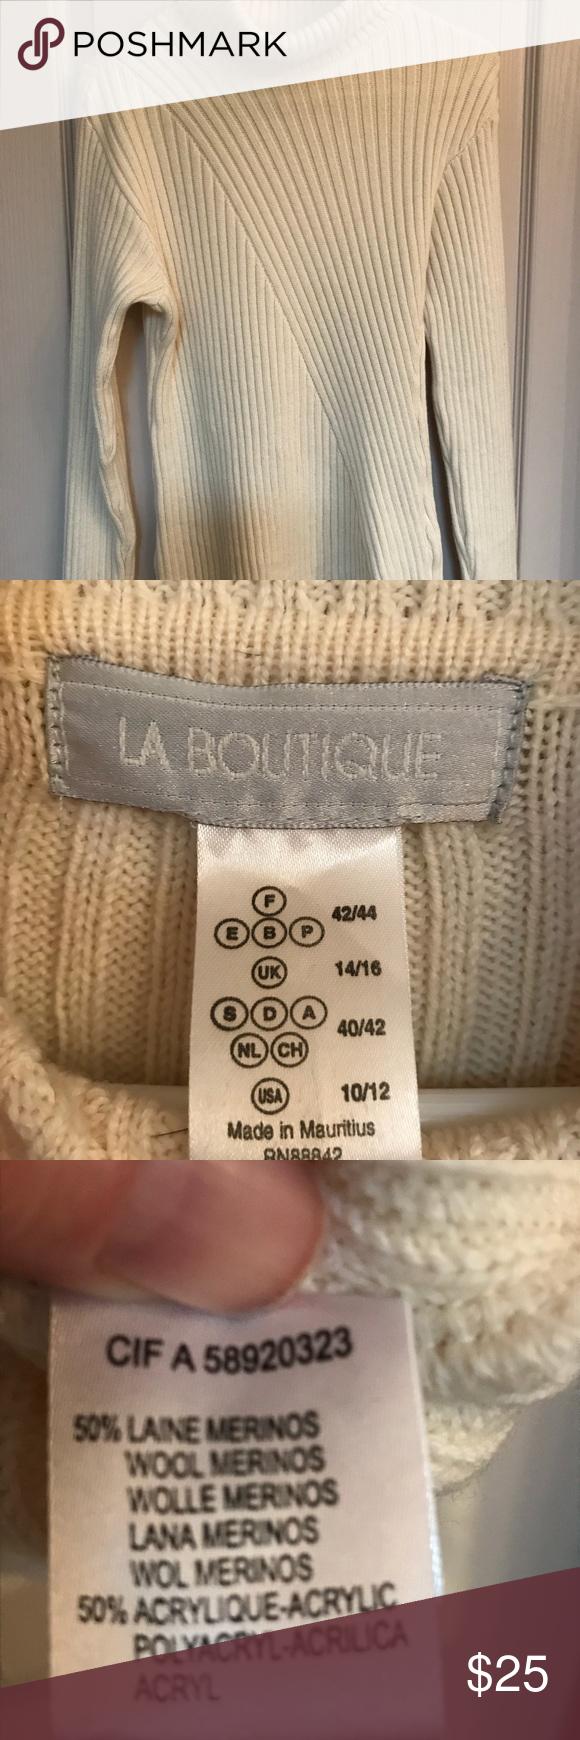 Cream Turtleneck Slimming Diagonal Weave Wool And Acrylic Turtleneck Sweater Like New La Boutique Sweaters Boutique Sweater Cream Turtleneck Wool Sweaters [ 1740 x 580 Pixel ]